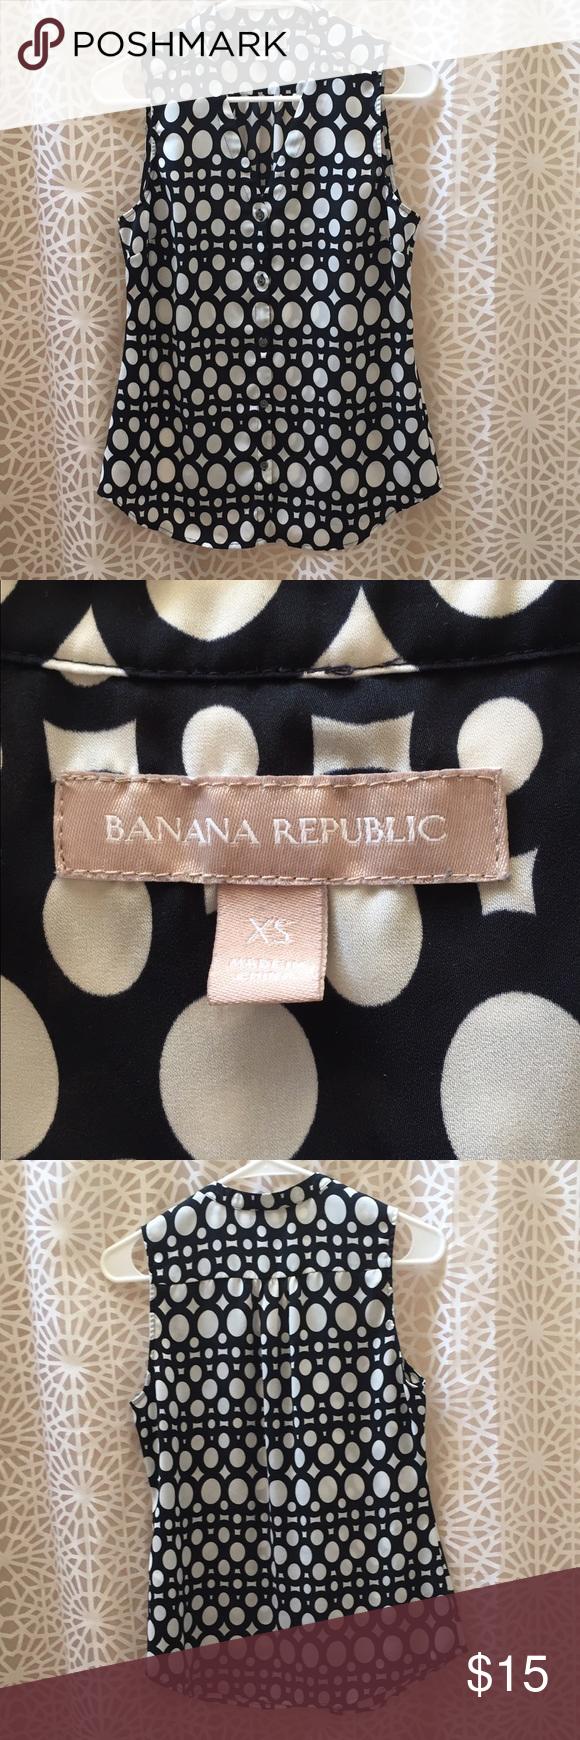 Beautiful Banana Republic top size XS Polka Dot banana republic top size XS, great condition Banana Republic Tops Blouses